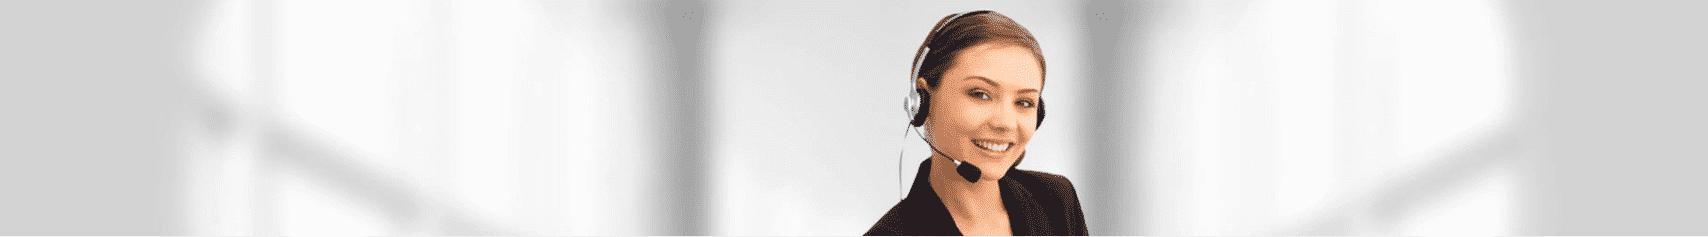 Texas Call Centers | Call Centers in Texas | Call Centers in Dallas | Call Centers in Texas | Houston | Call Centers in Austin